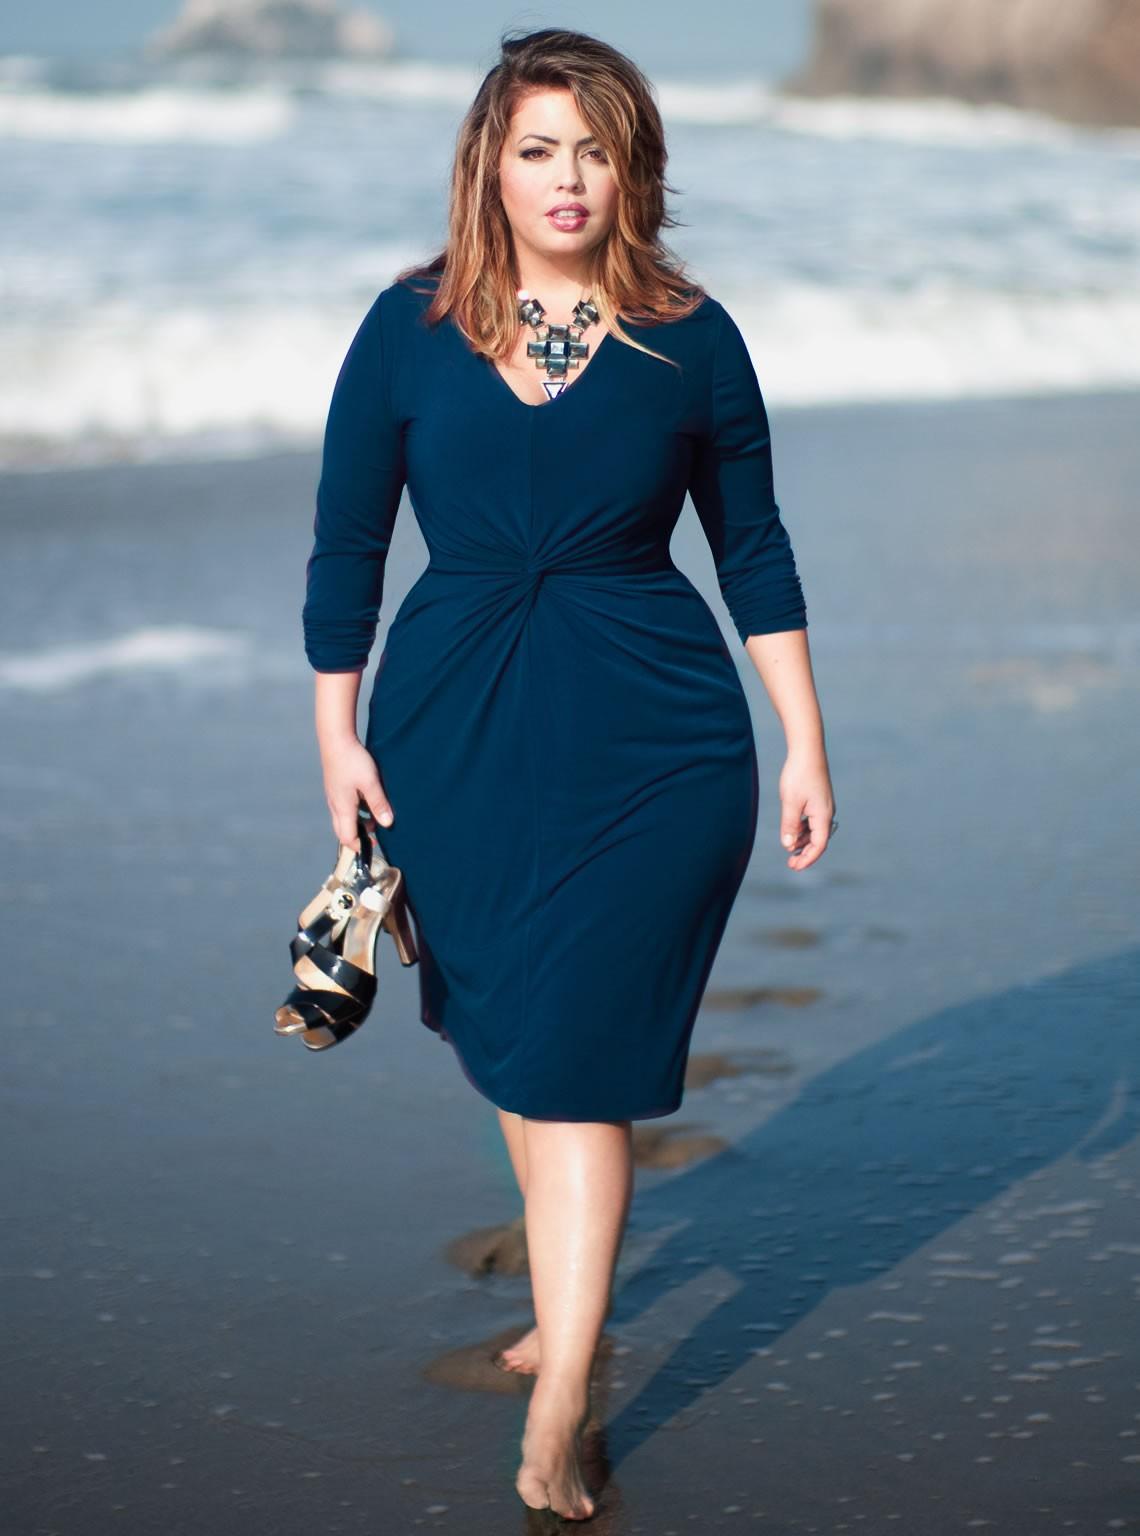 Plus-Size-Forget-Me-Not-Career-Dress - Greek American Girl